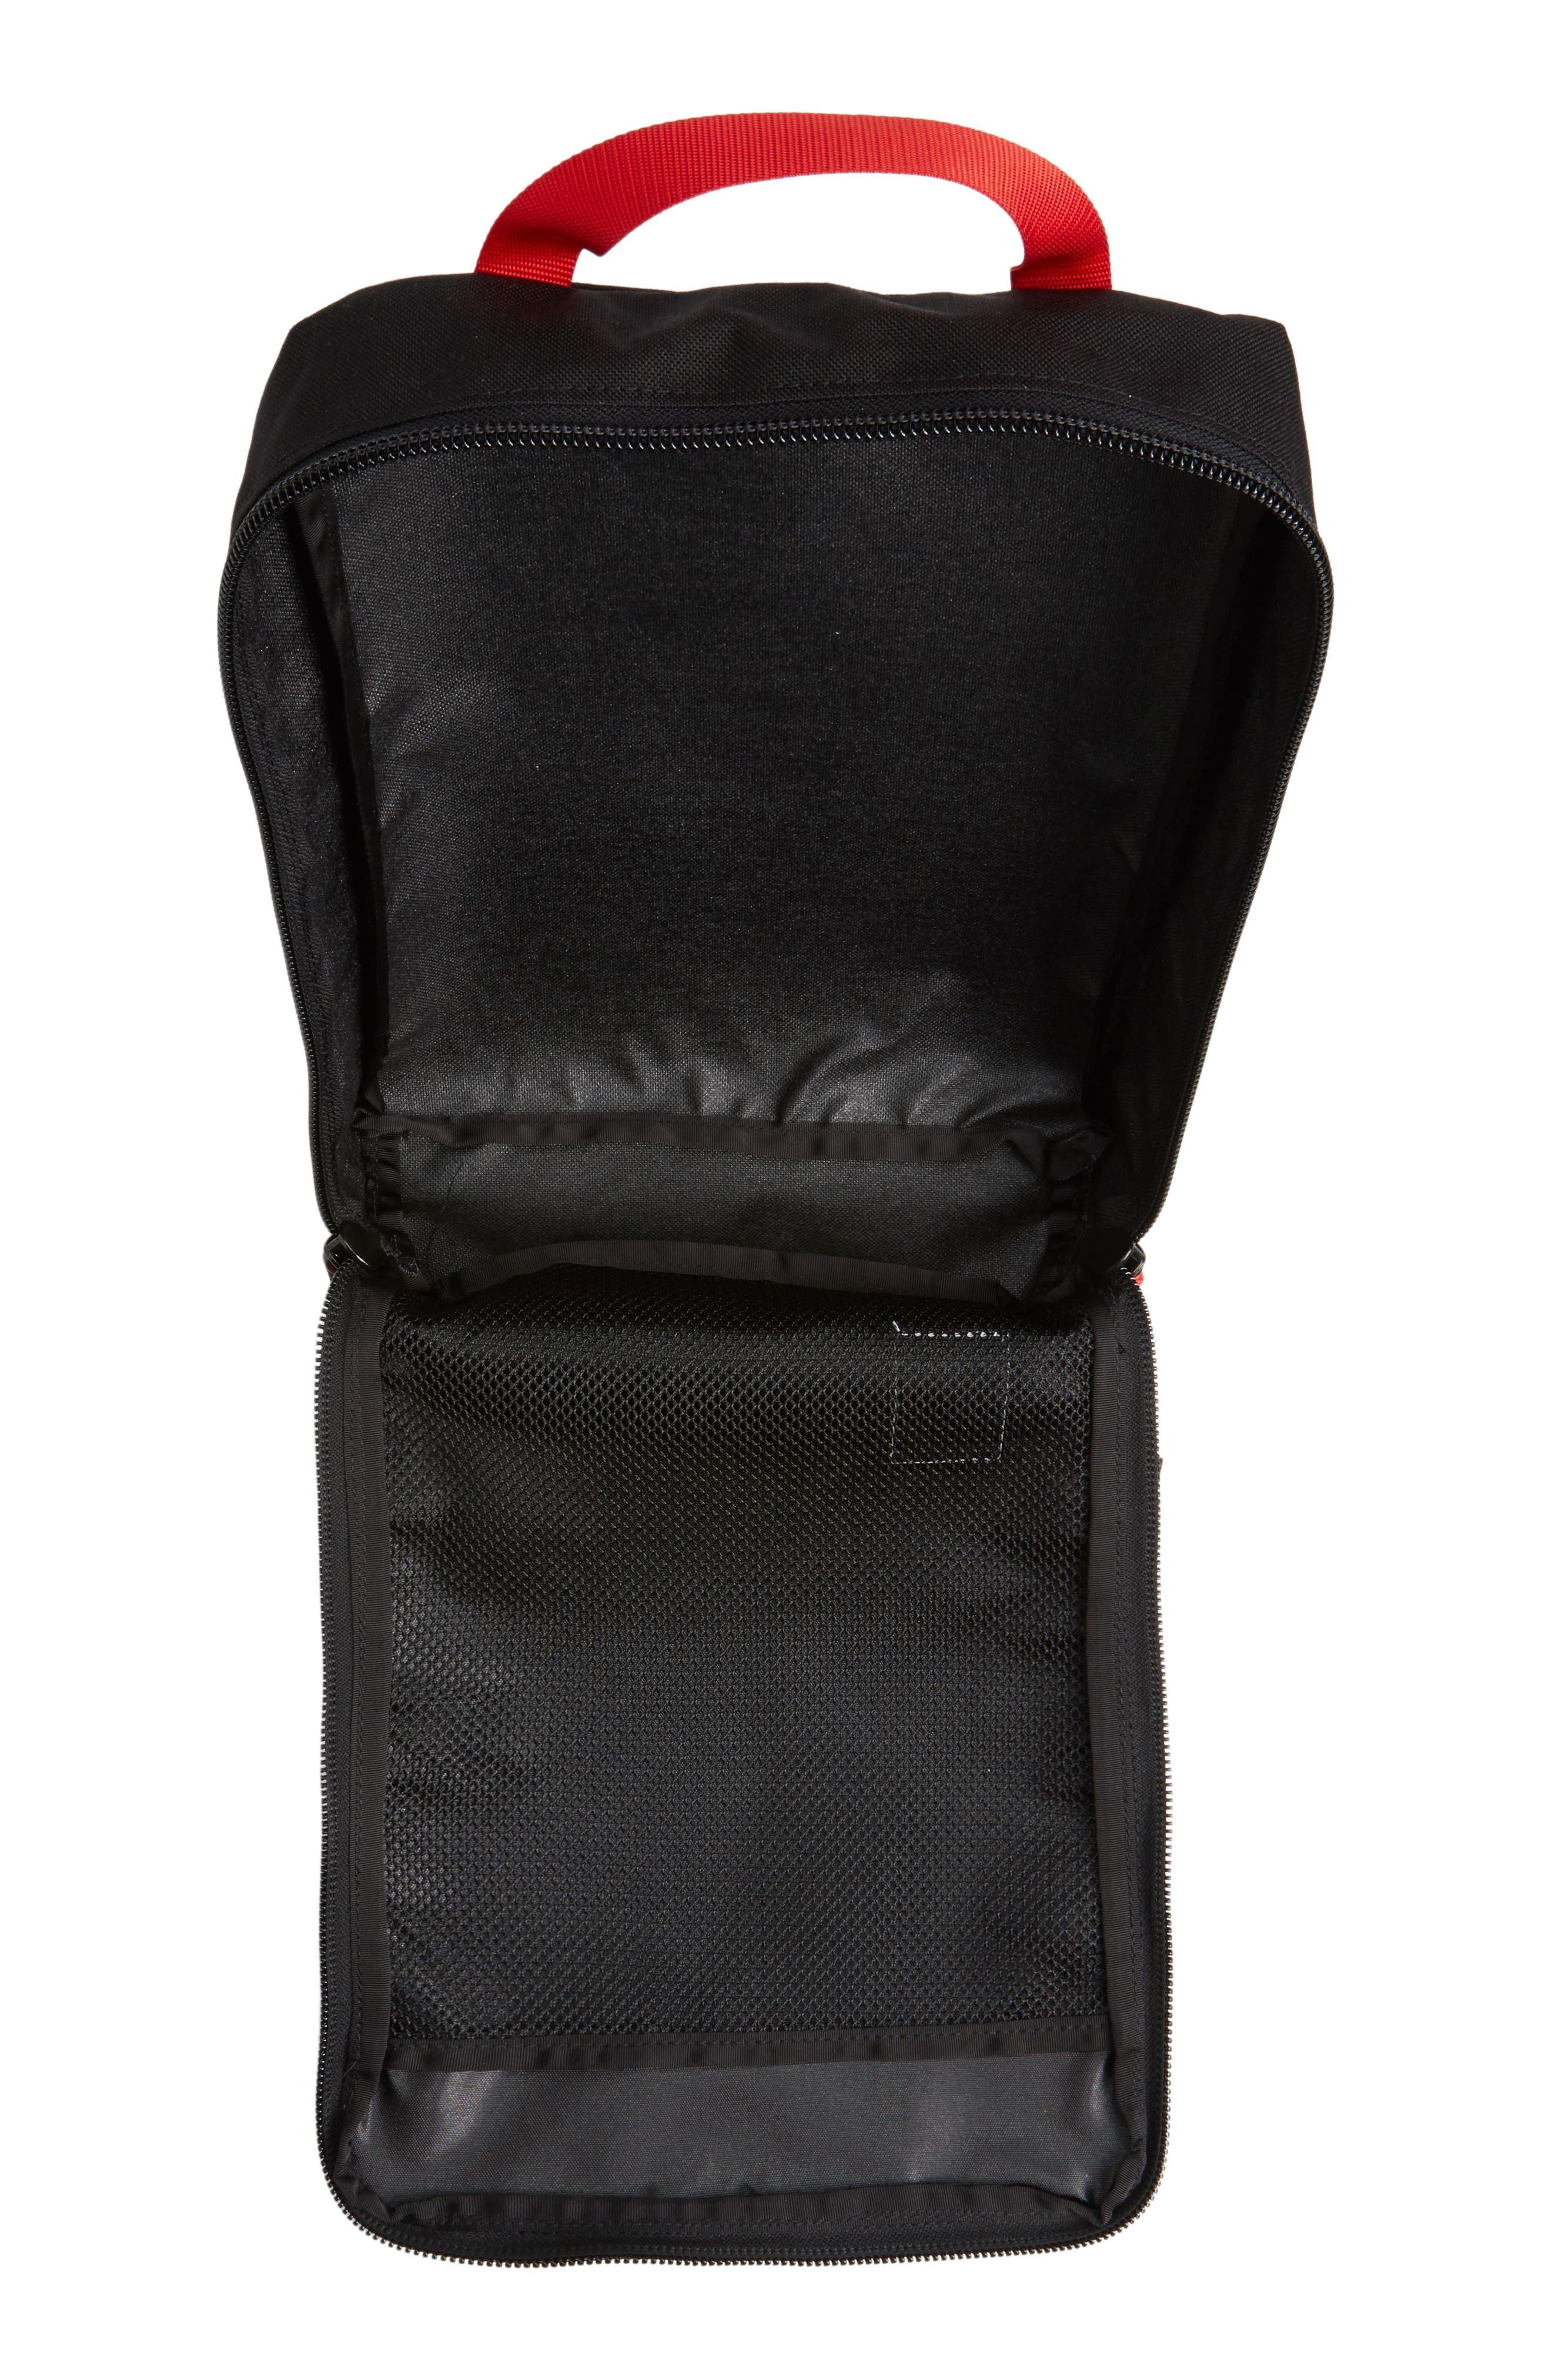 Alternate Image 3  - Topo Designs Pack Bags Tote